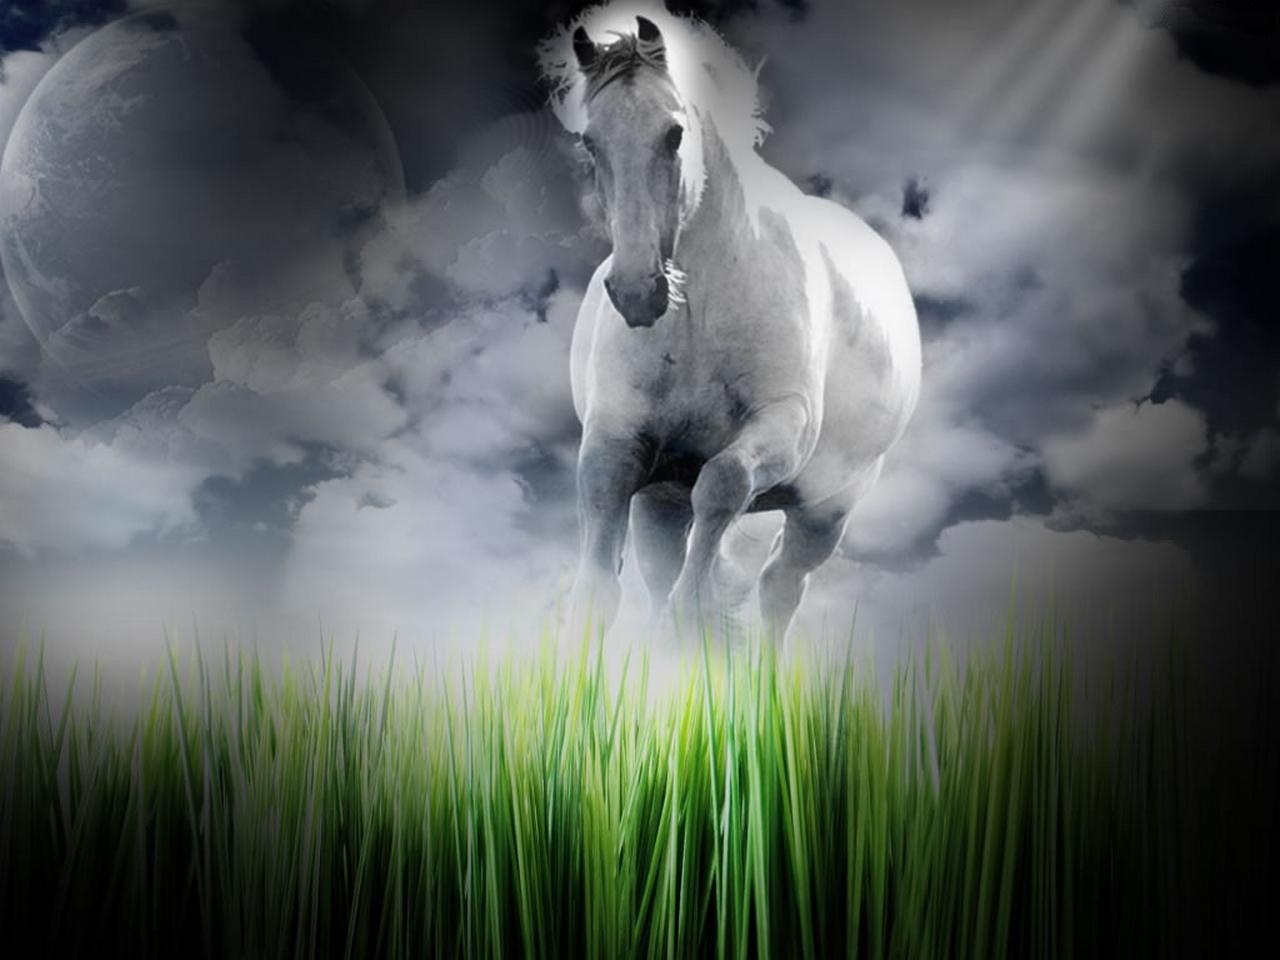 Animal Digital Art Wallpapers | Download Wallpaper,Desktop ...